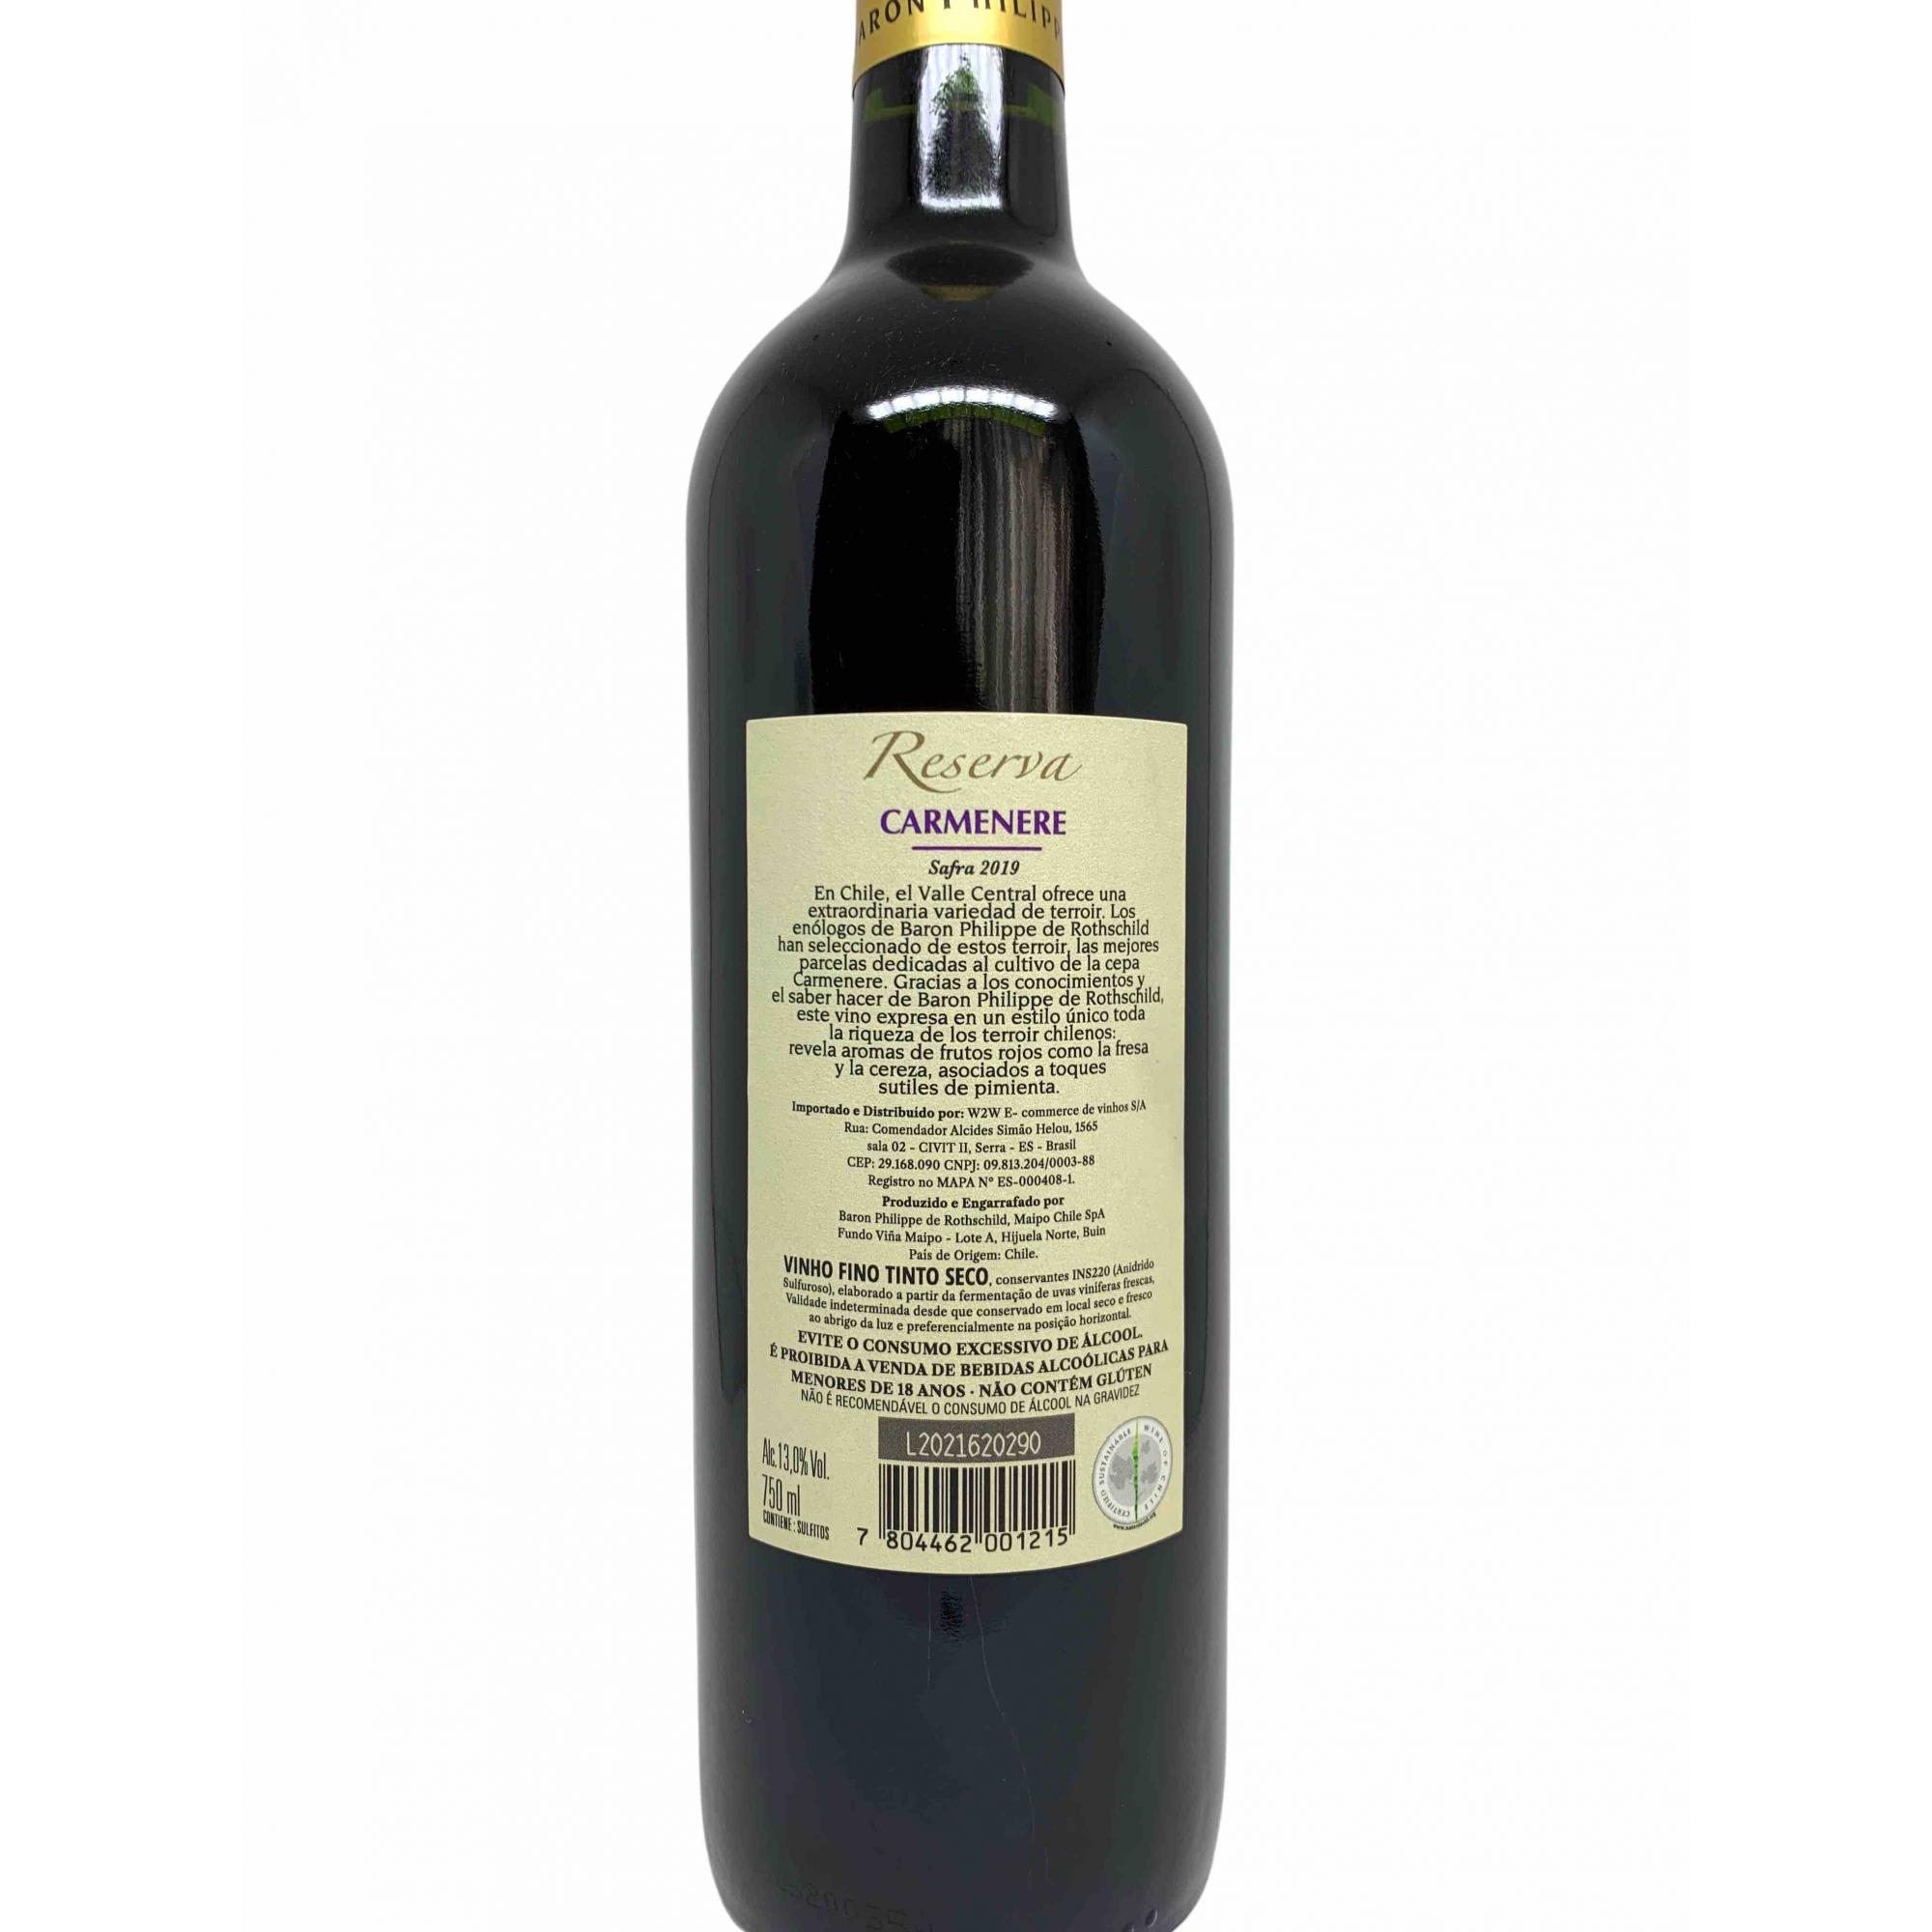 Vinho Tinto Baron Philippe de Rothschild Reserva Carmenere 750ml  - ADEGA FARRET